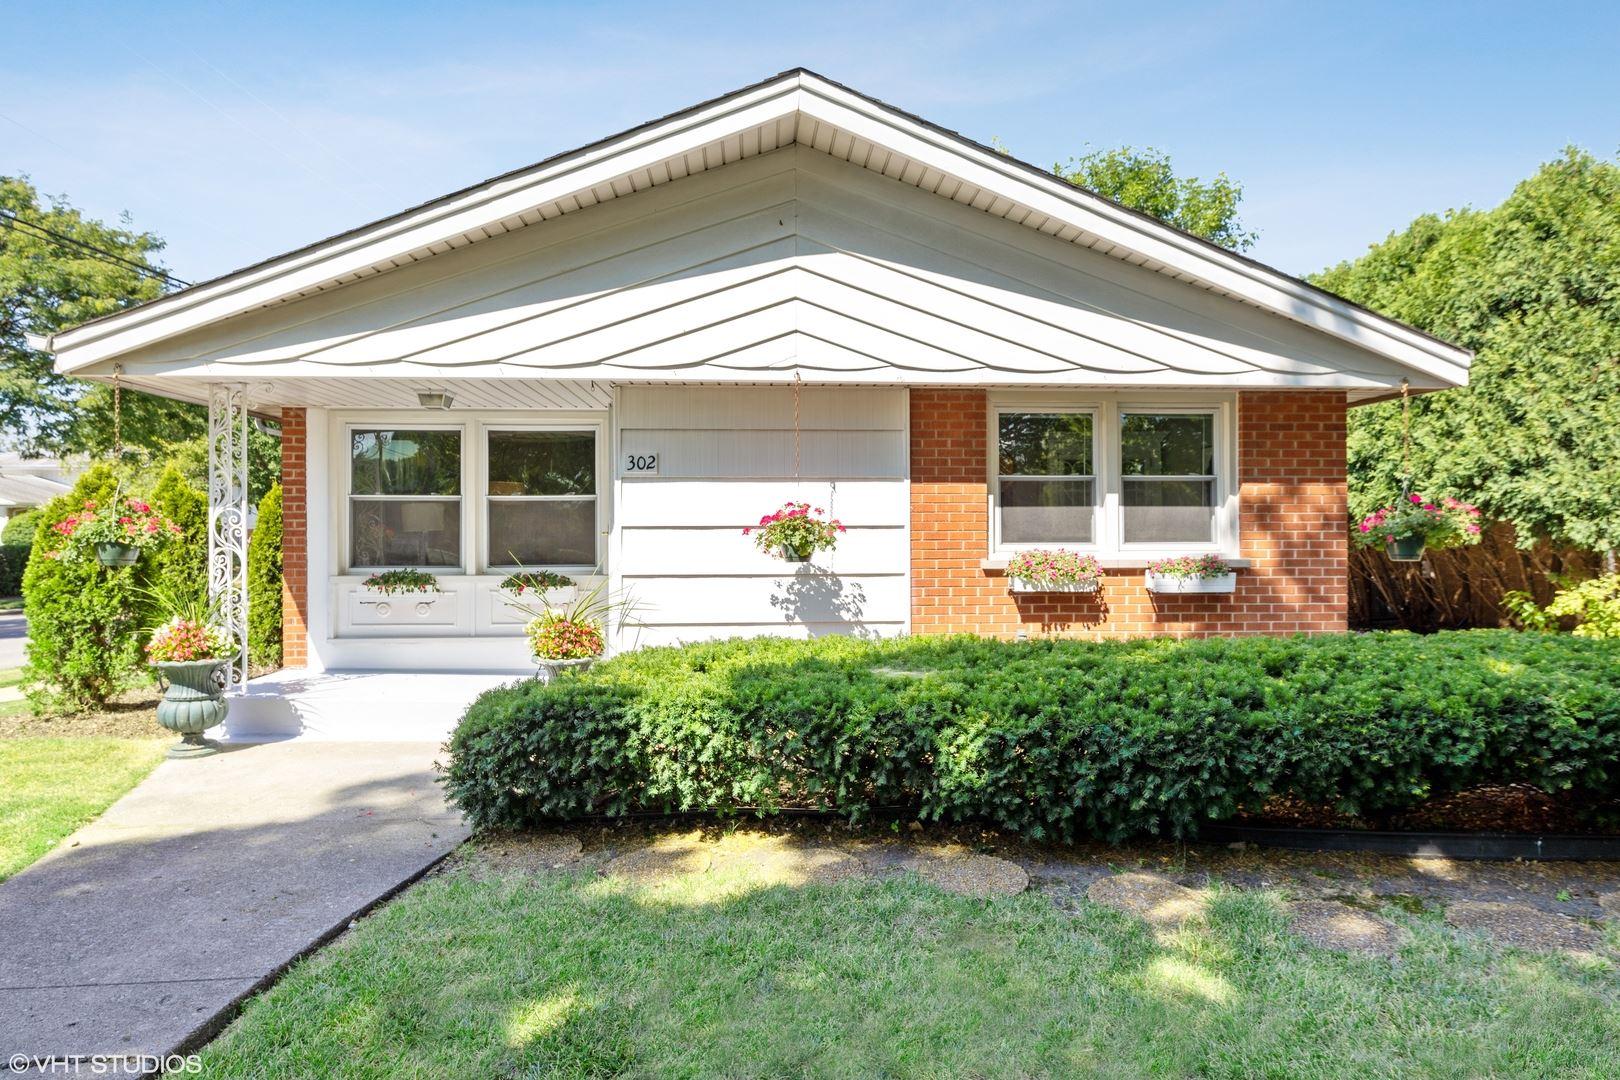 302 N Edgewood Avenue, La Grange Park, IL 60526 - #: 10811481